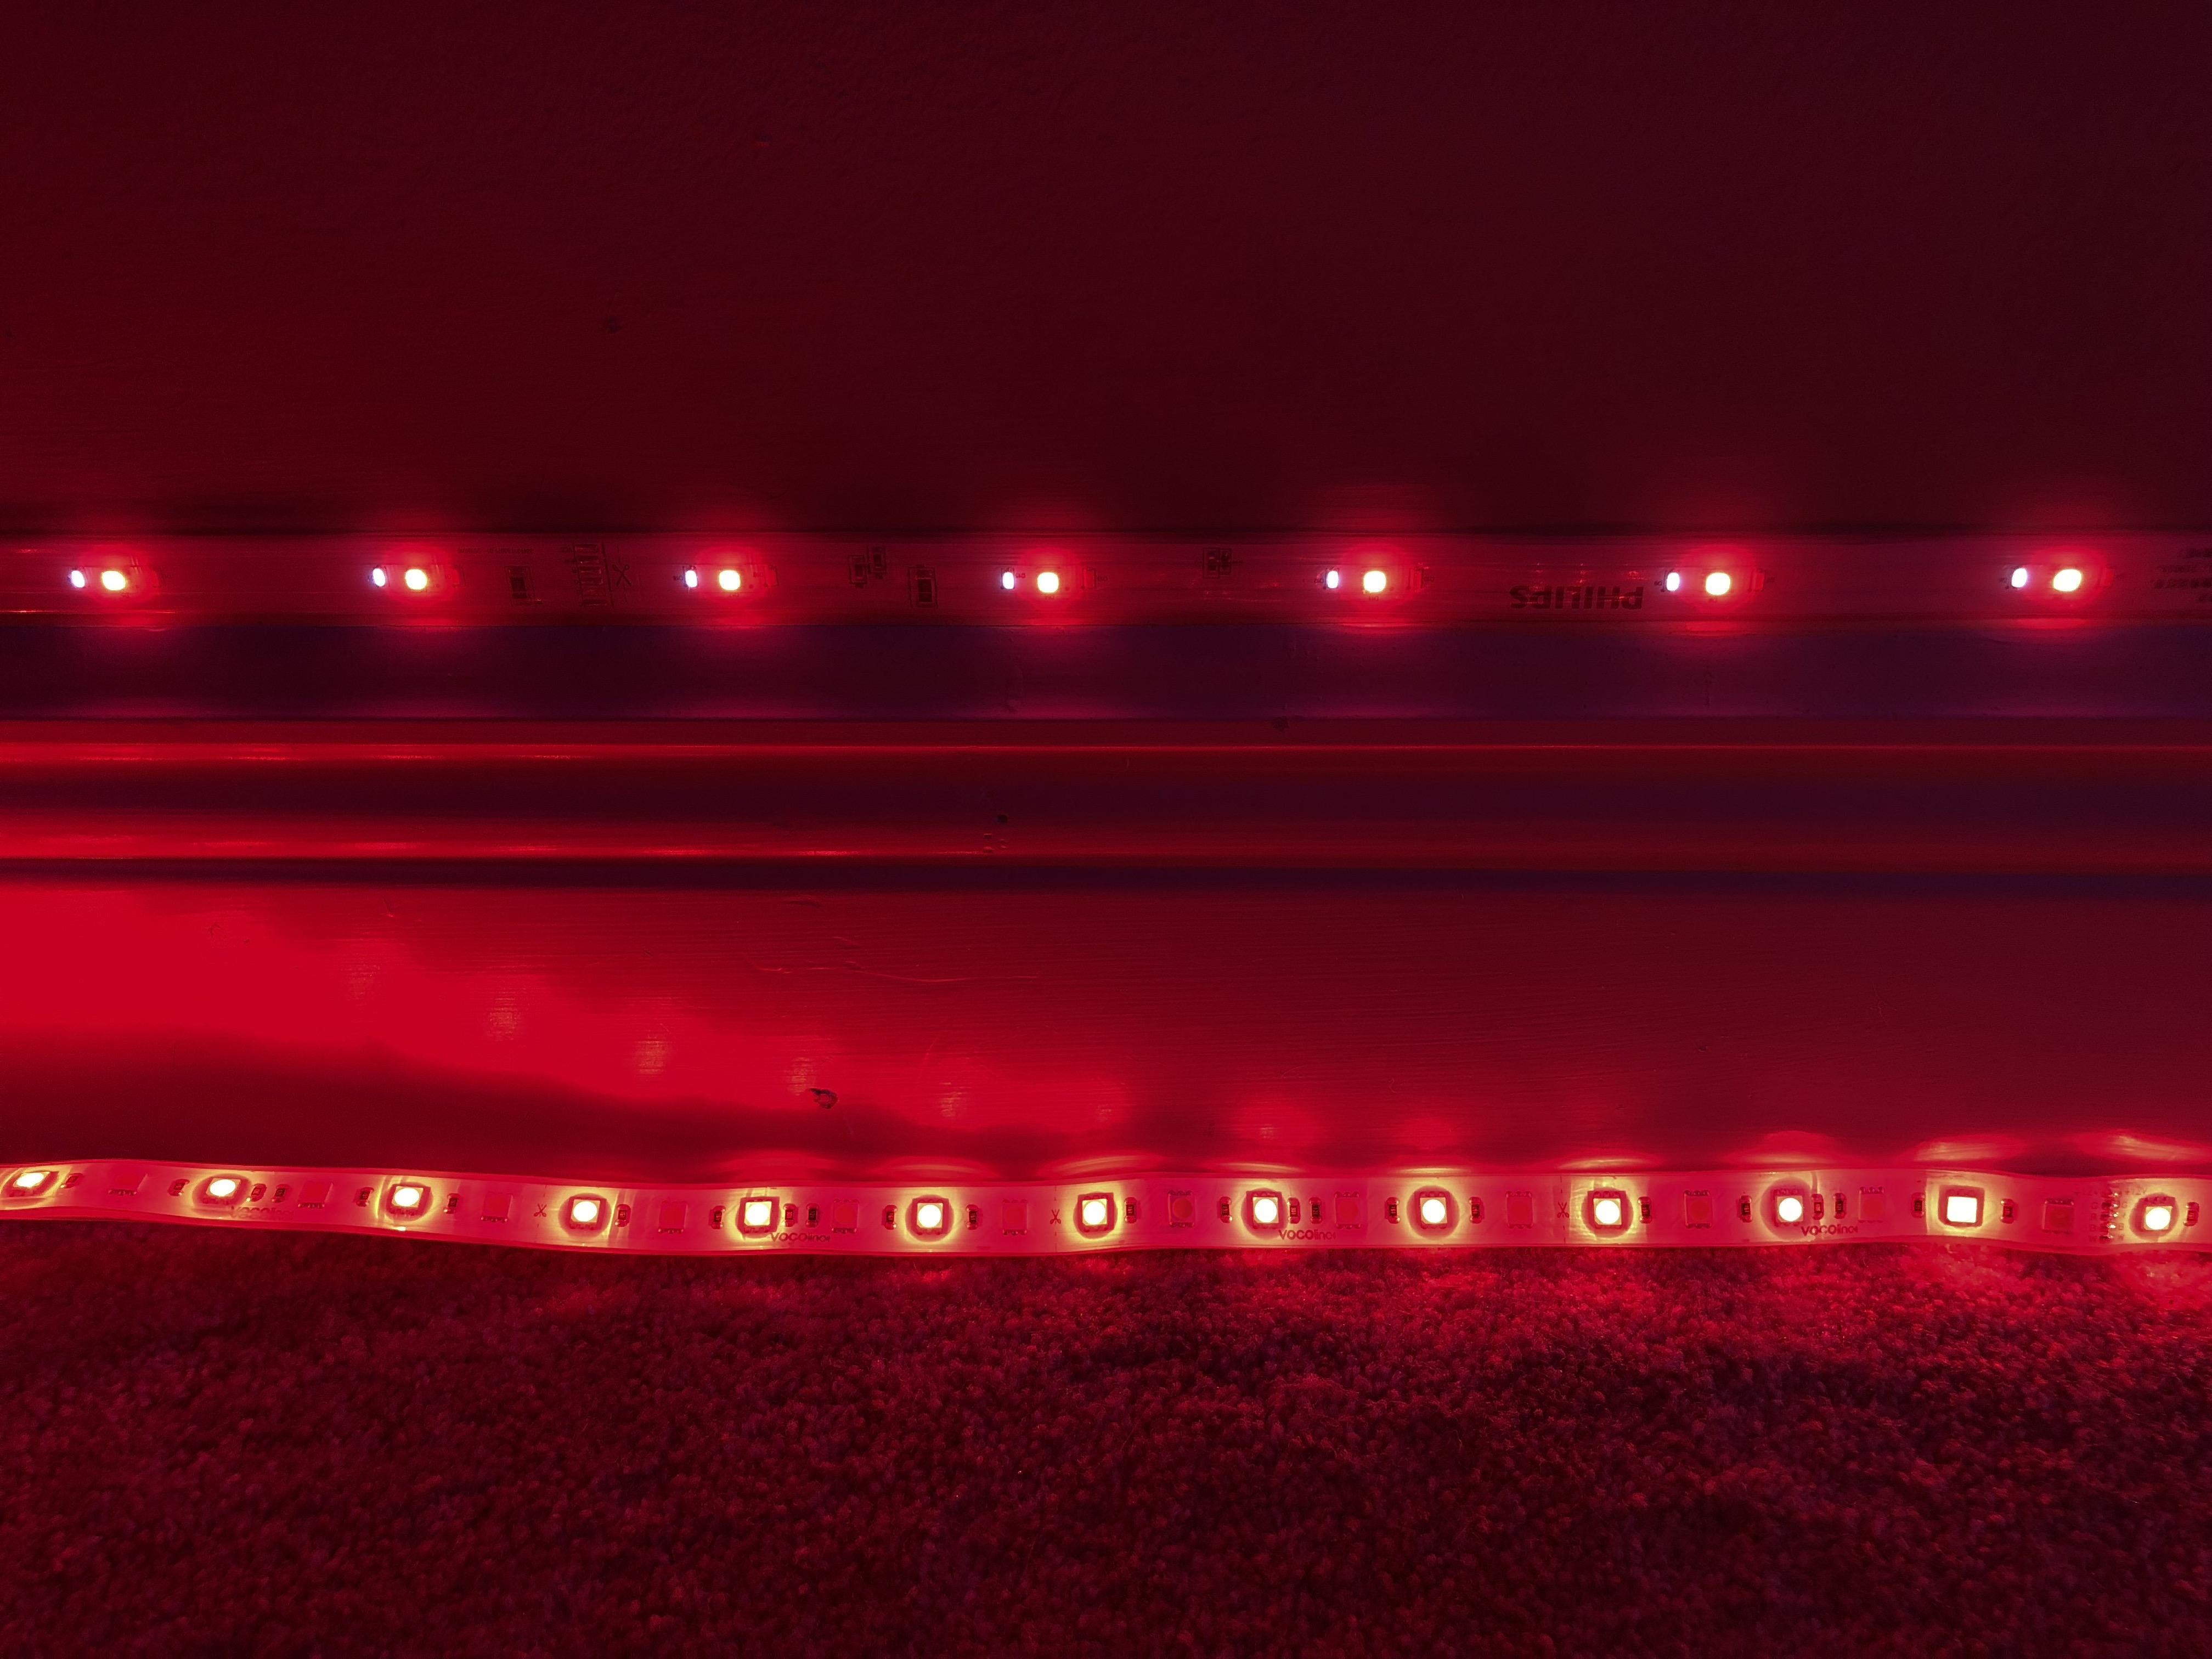 Review: VOCOlinc's HomeKit LED light strips offer the best